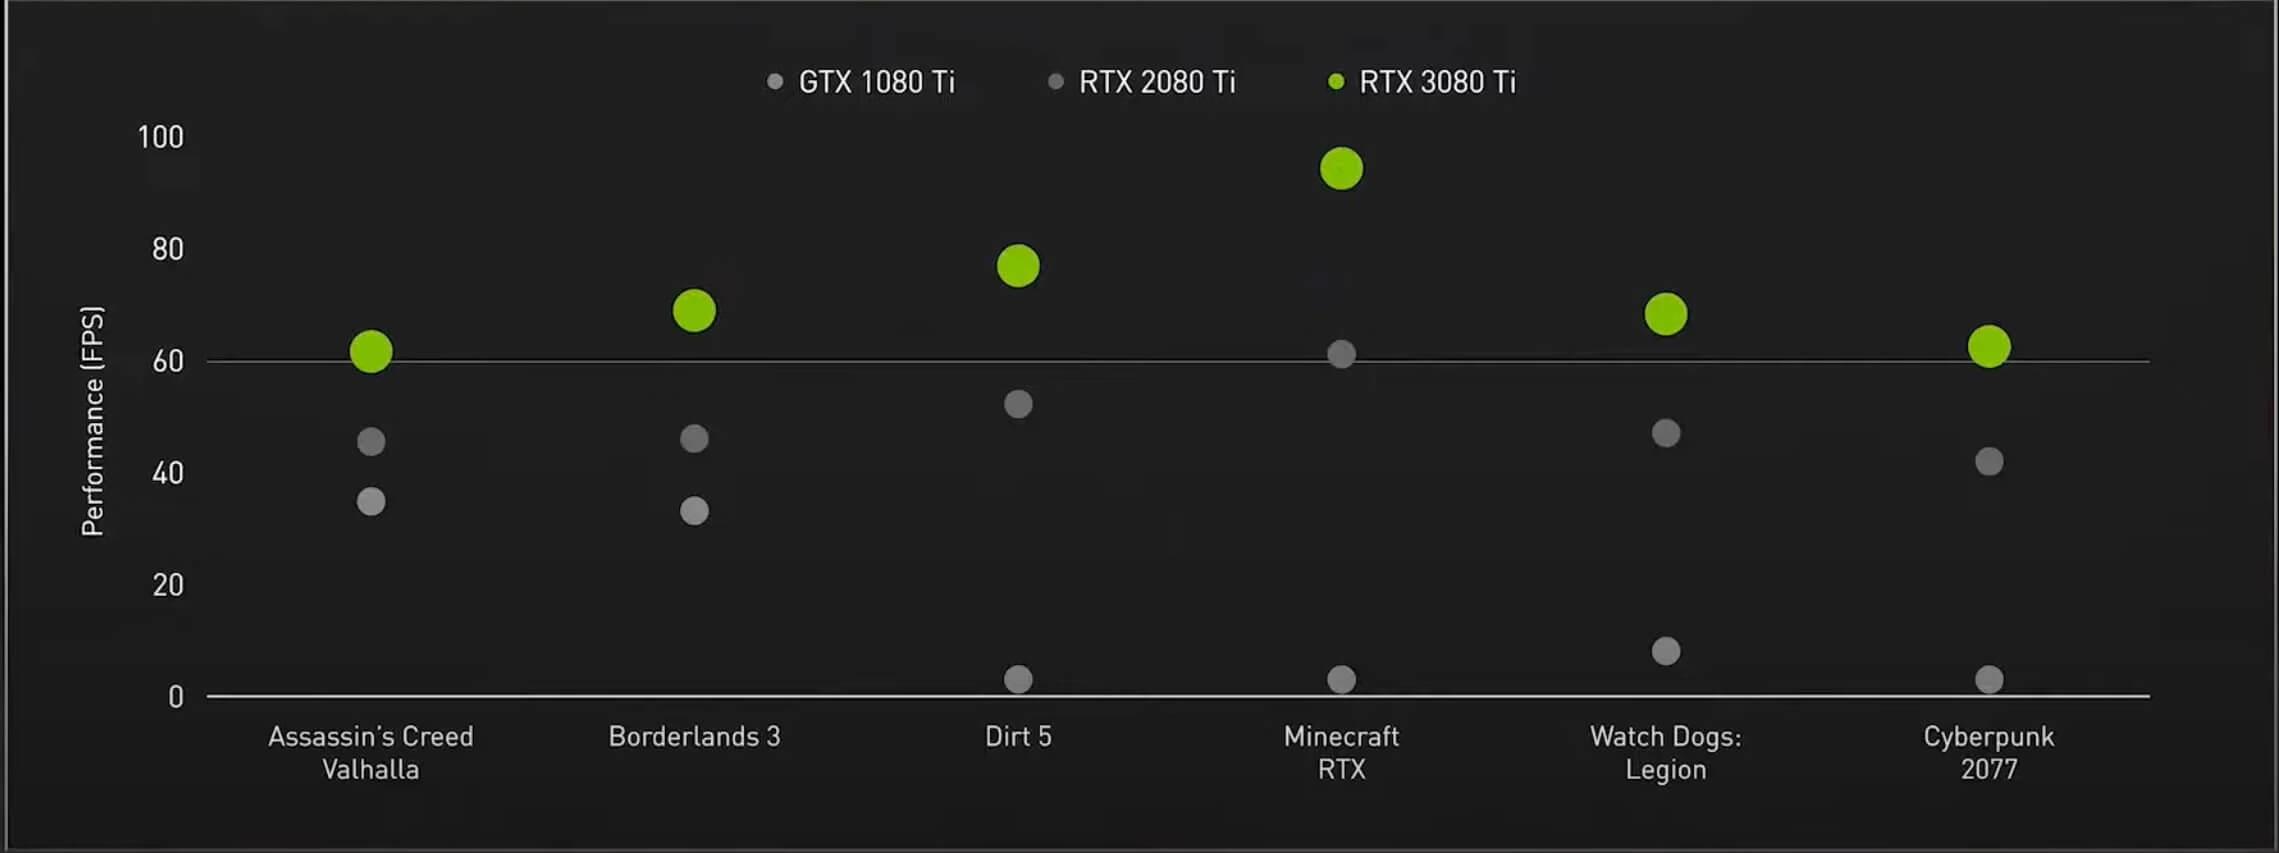 early RTX3080Ti gaming benchmarks